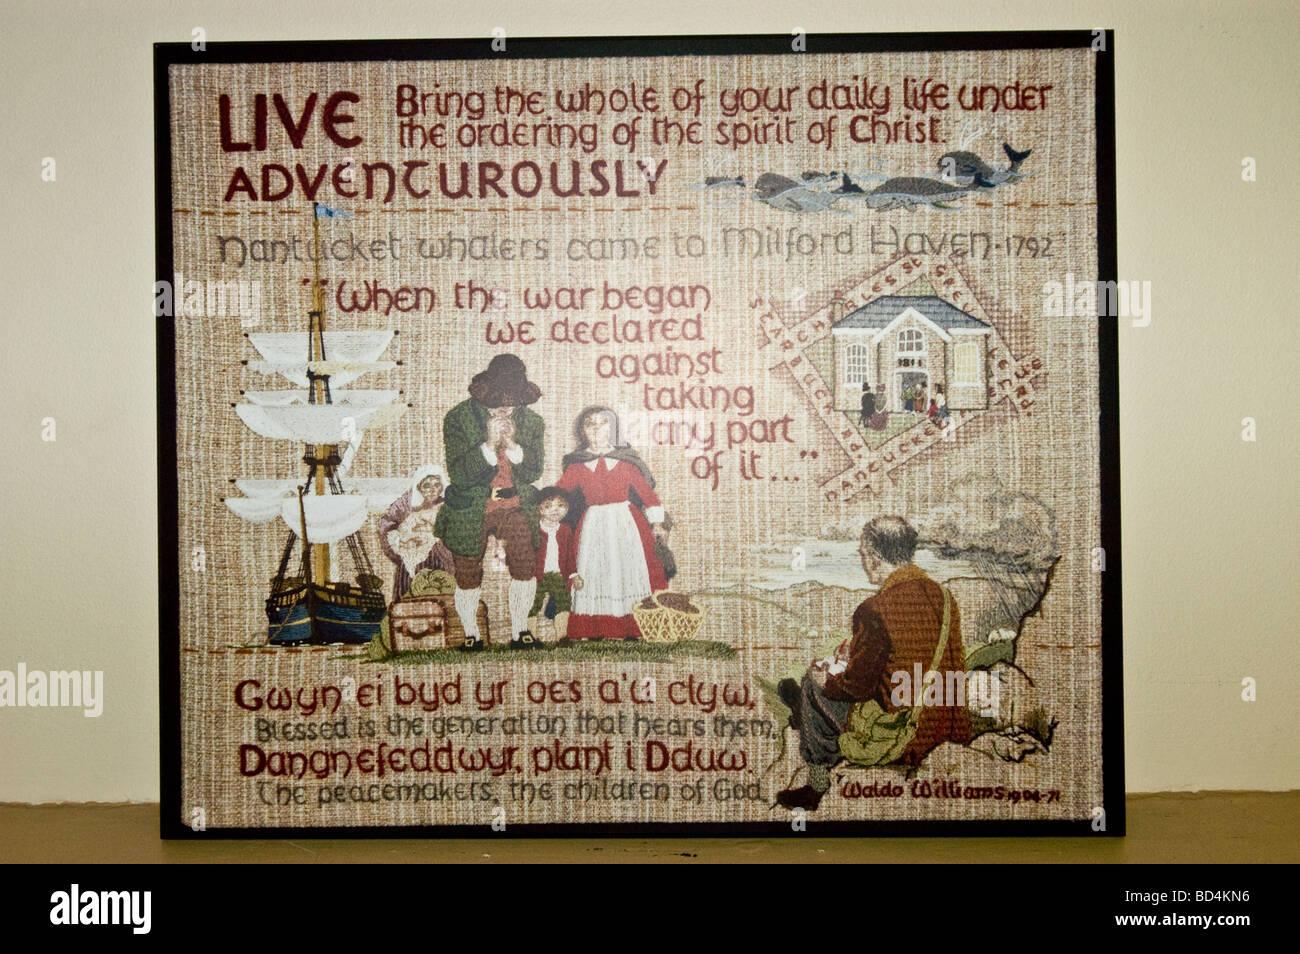 Quaker wall poster inside Quaker House in Dartmouth, Halifax, Nova Scotia, Canada - Stock Image